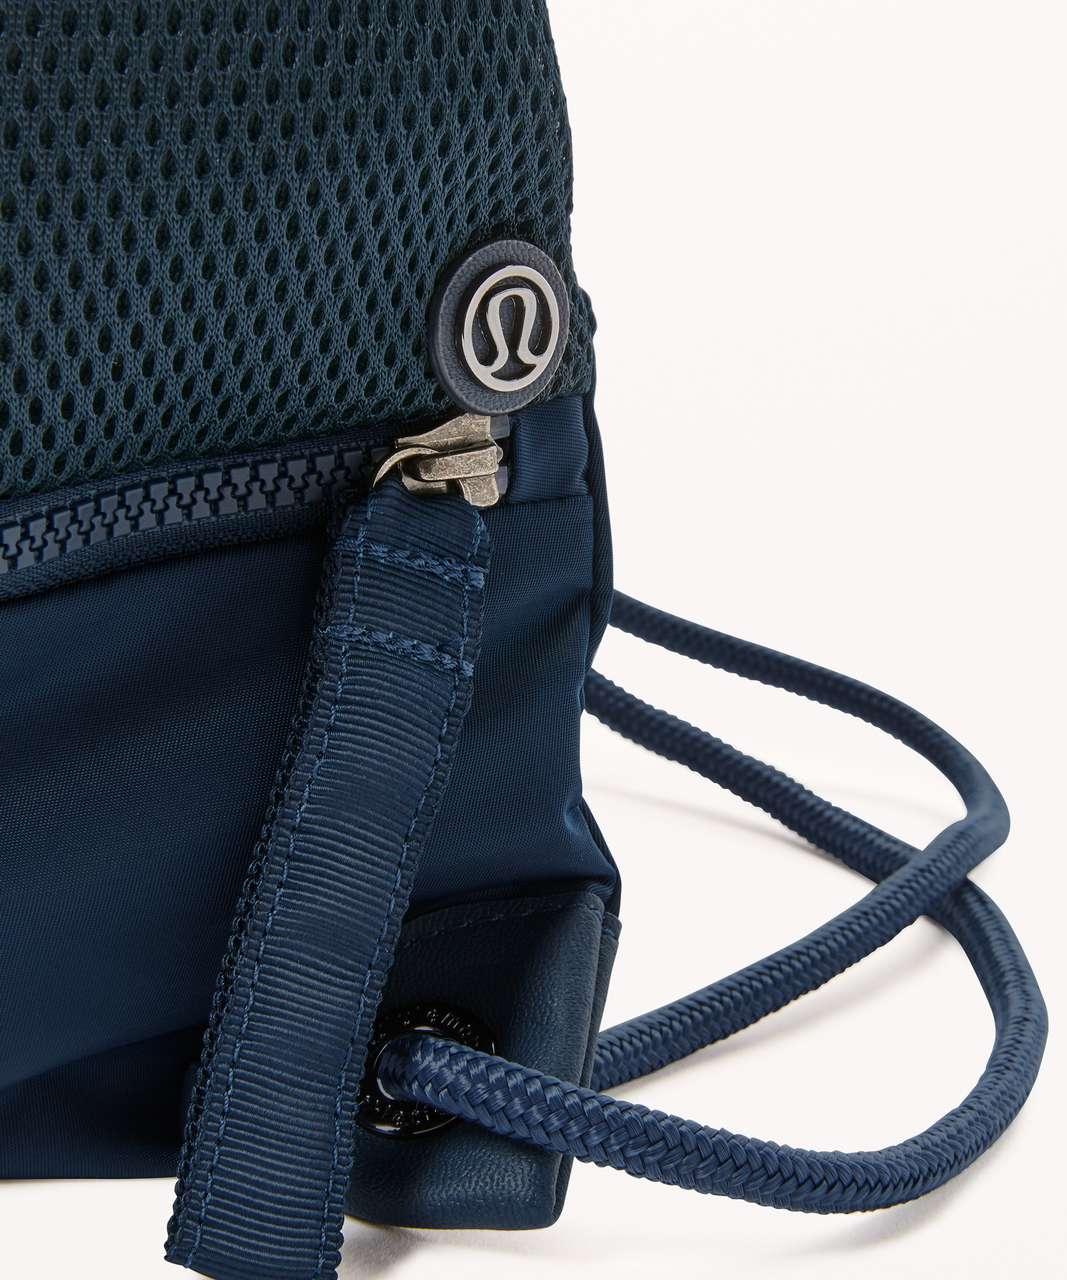 Lululemon Go Lightly Cinch Bag - Jaded